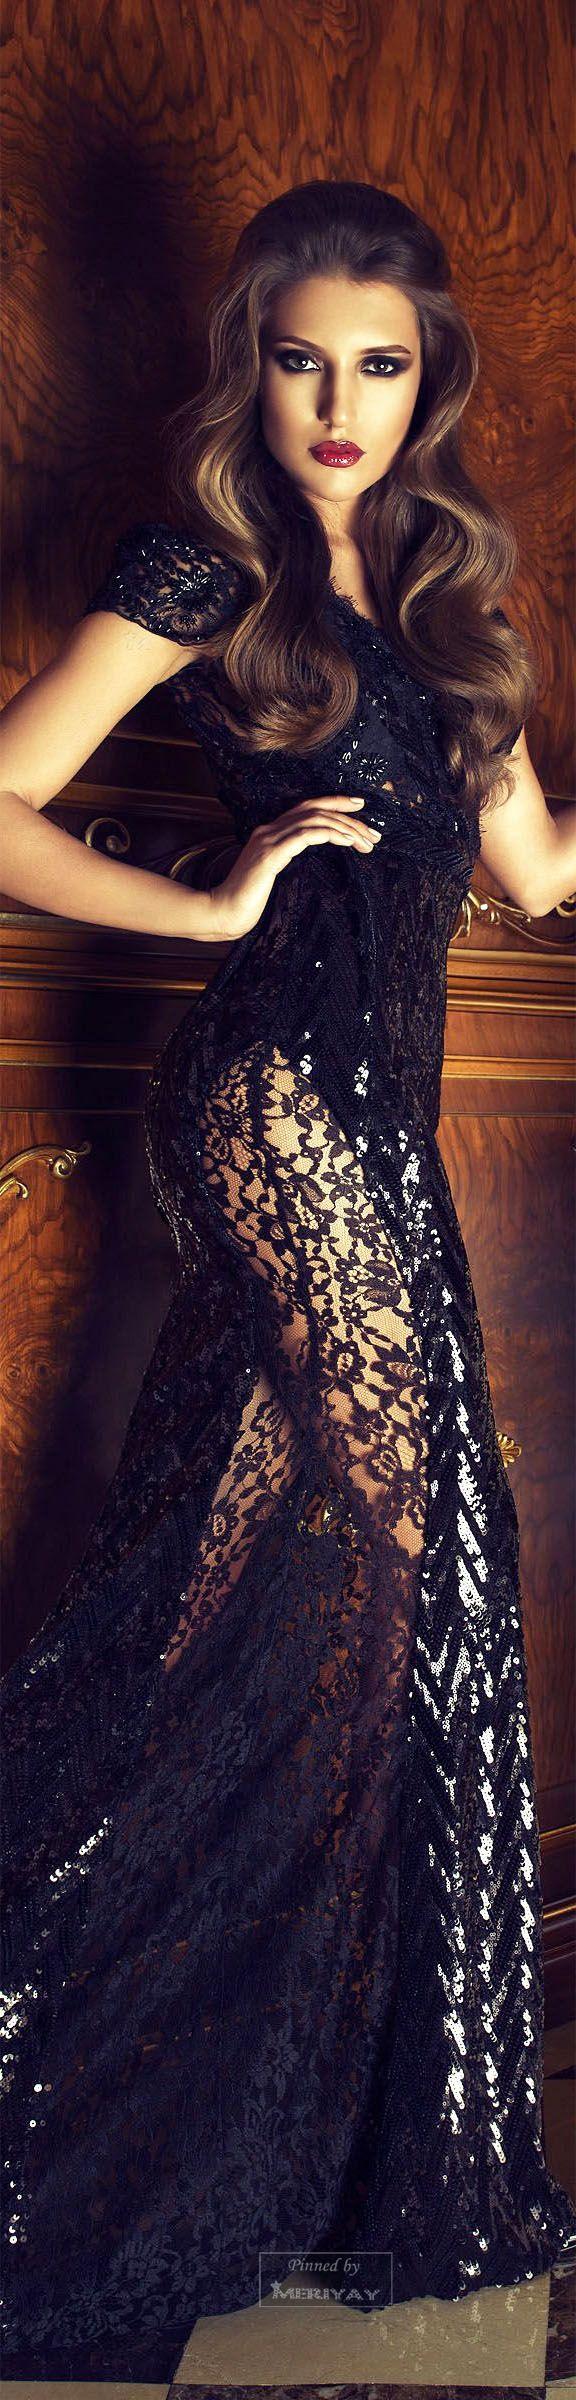 Lady Millionairess / karen cox. Cristallini gown. Cristallini Fall-winter, 2014-2015.